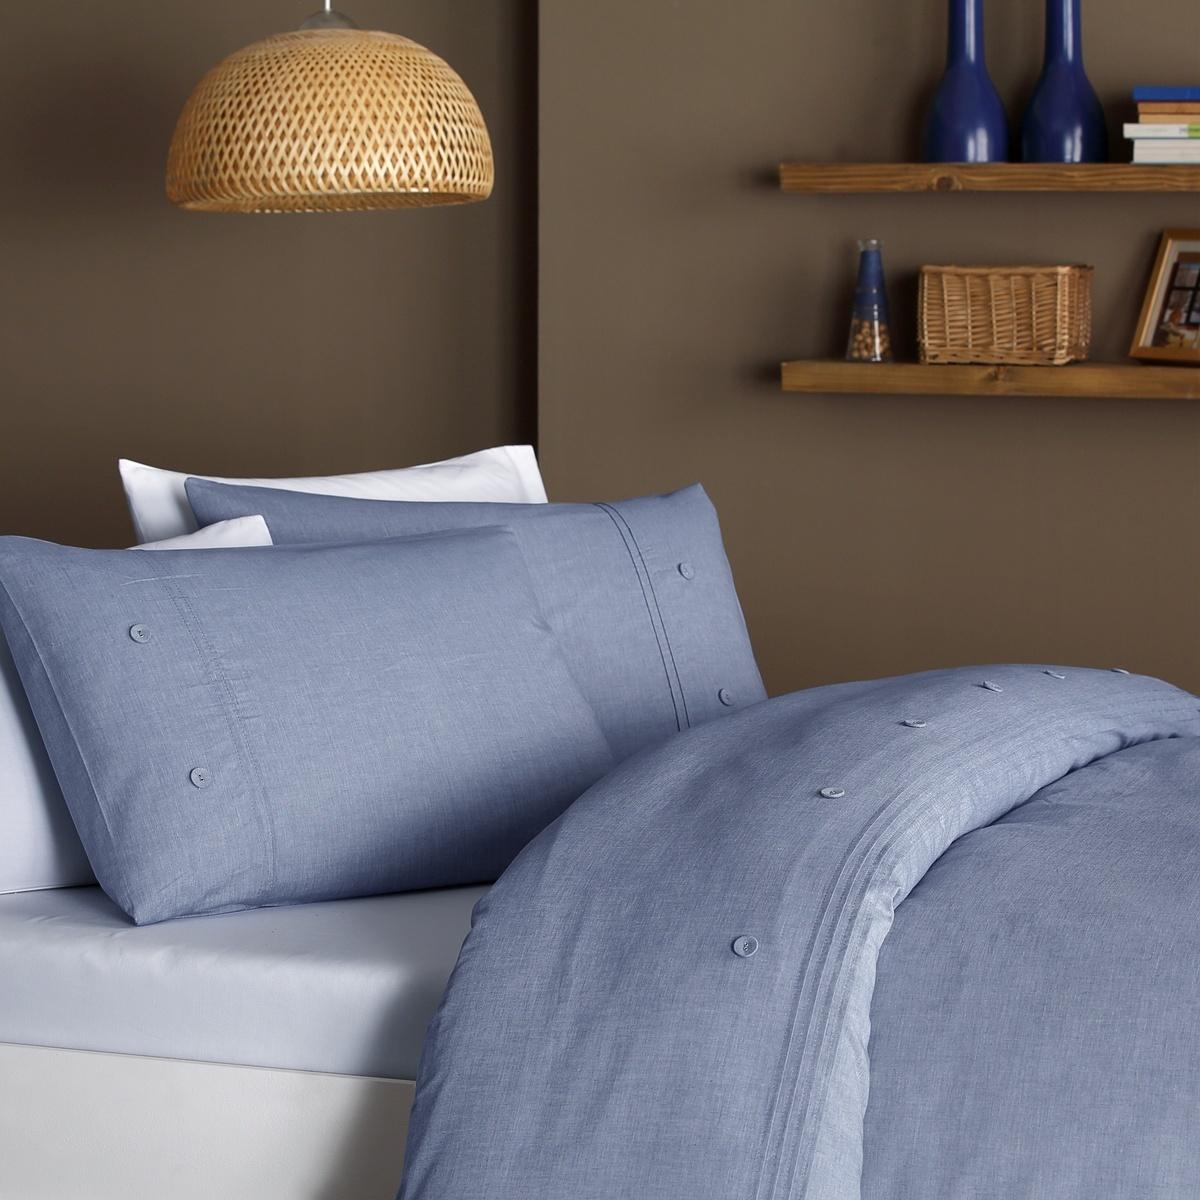 Stanley Hamilton Duvet Set Luxury Hotel Quality, 100% Finest Cotton, Denim Linen Look Bedding Set